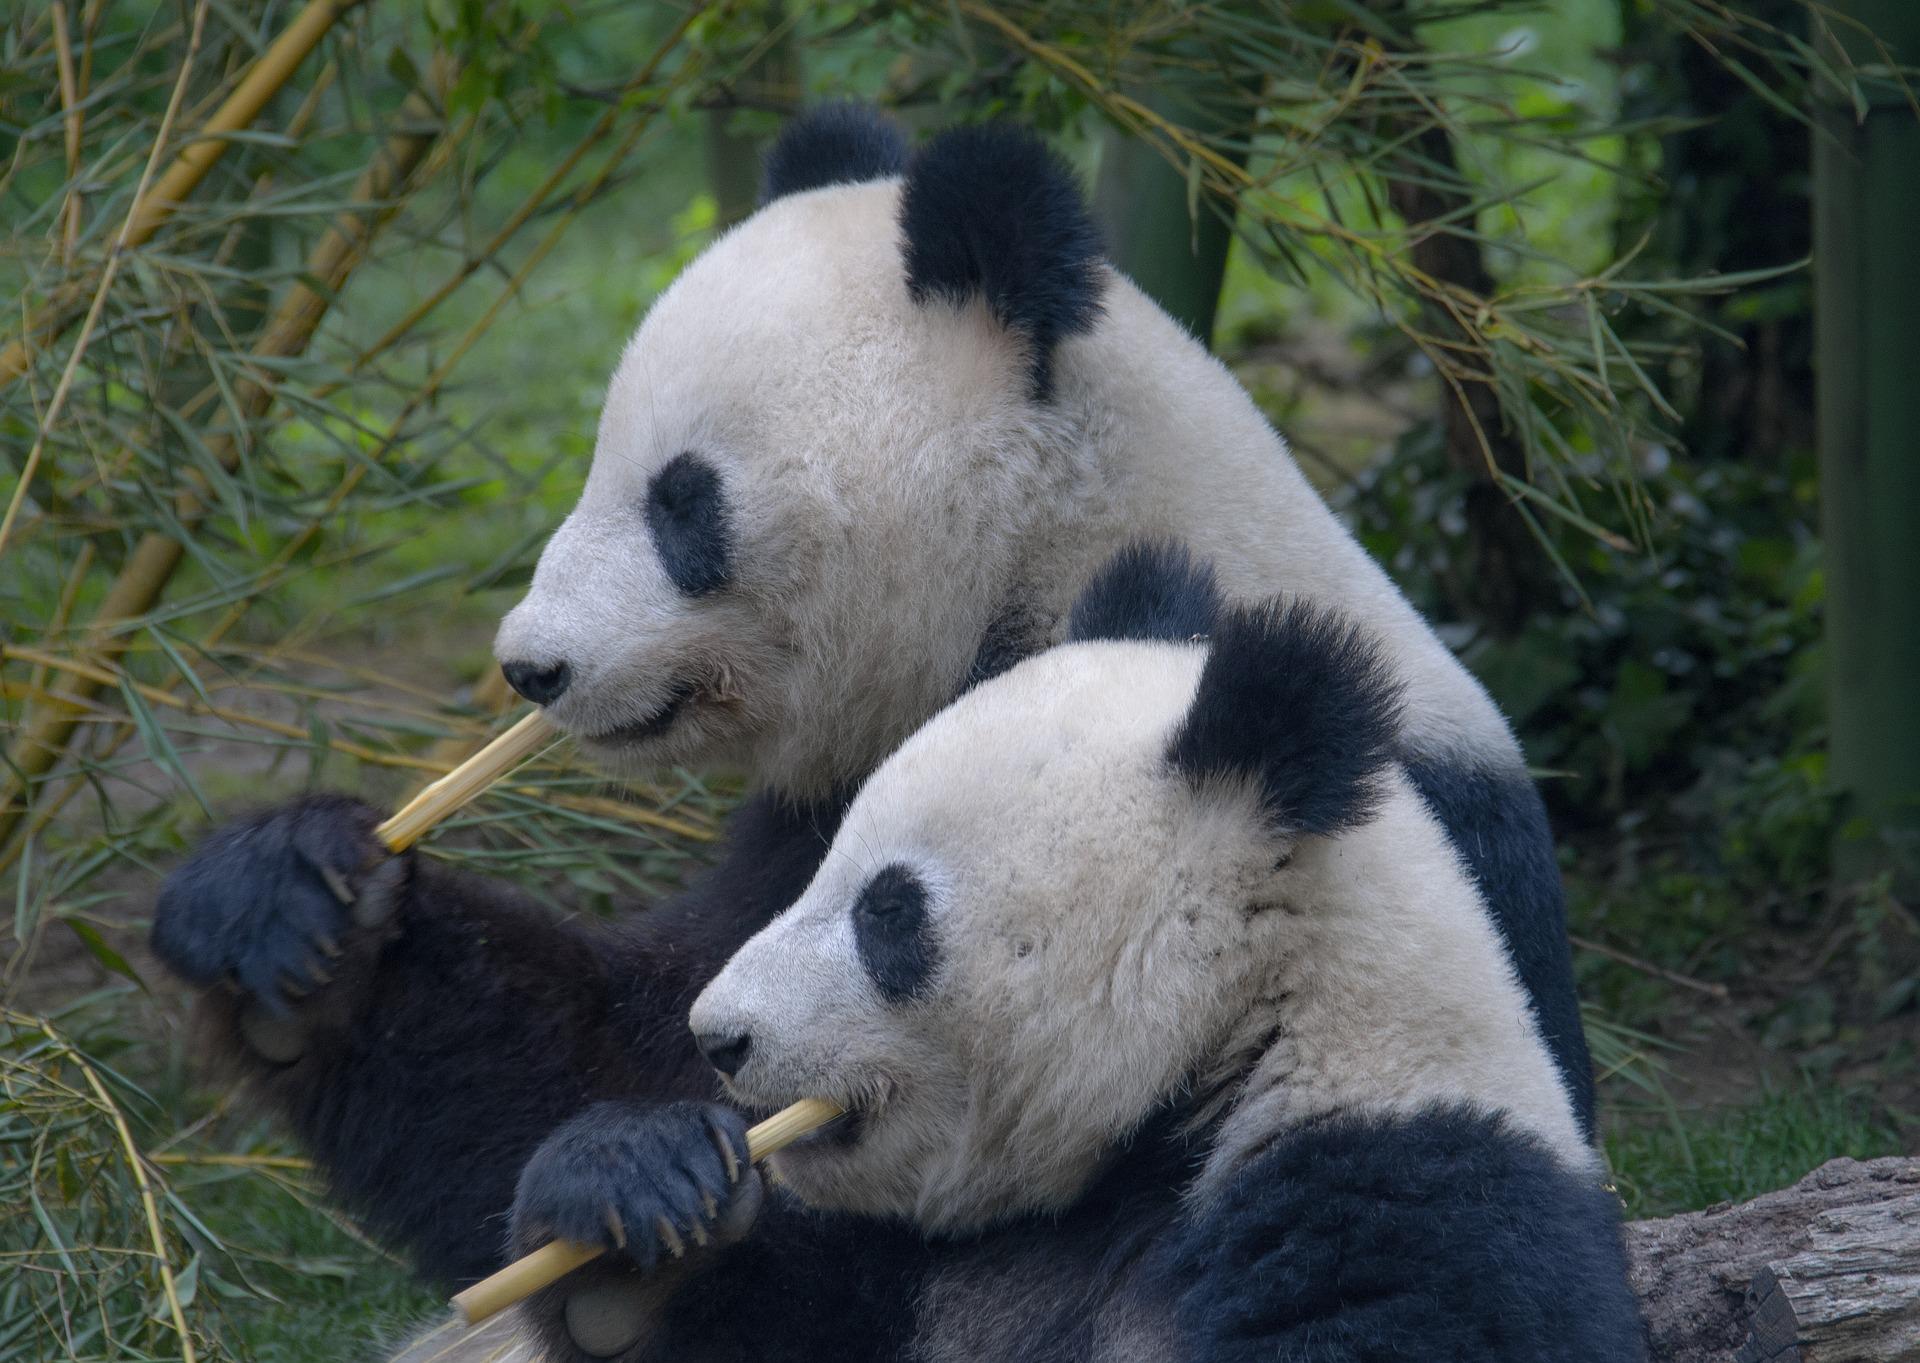 Großer Panda - big panda